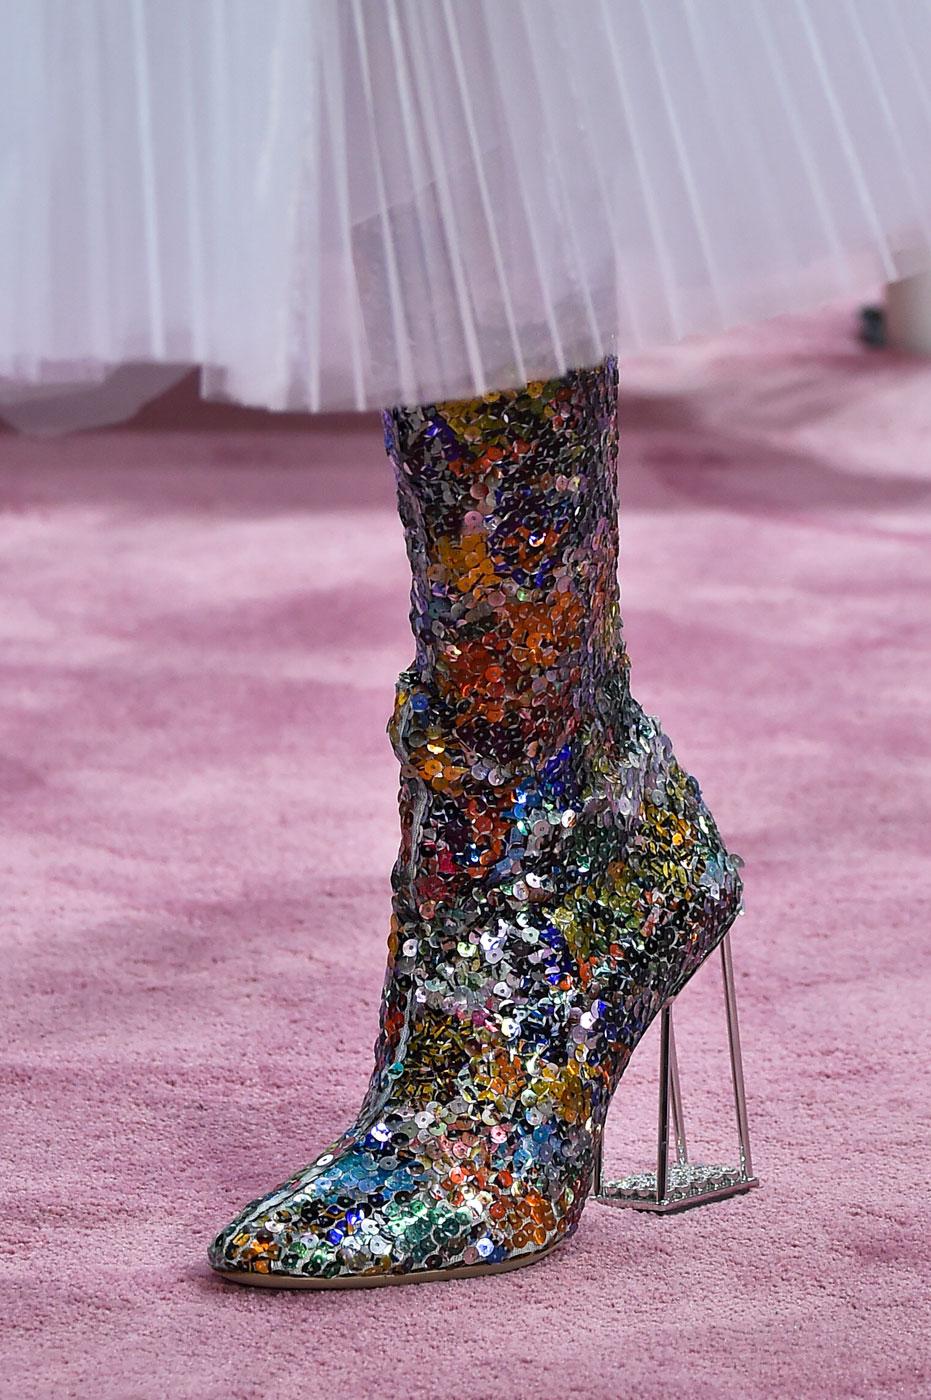 Christian-Dior-fashion-runway-show-close-ups-haute-couture-paris-spring-summer-2015-the-impression-180